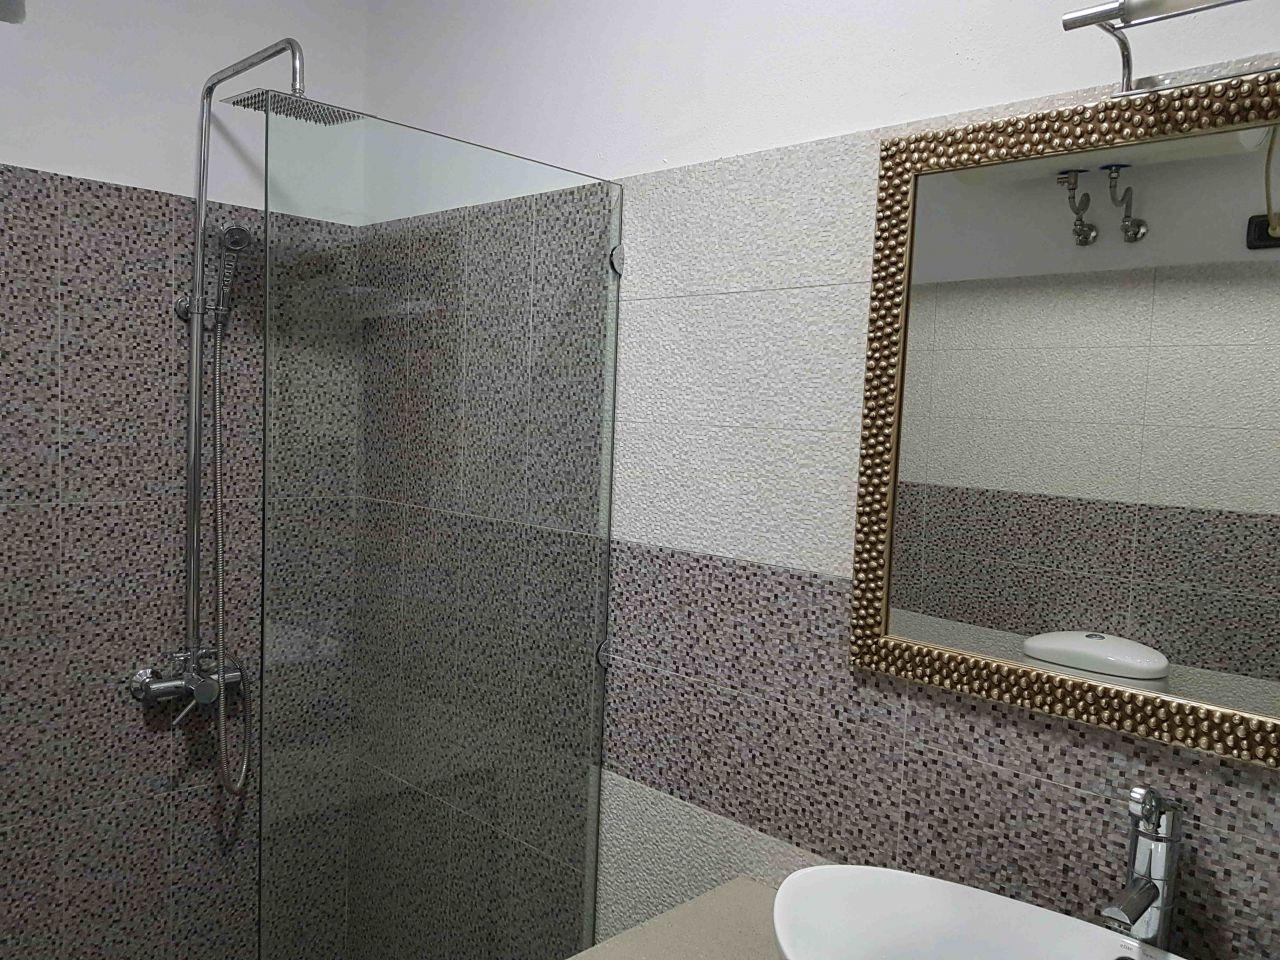 One Bedroom Apartment for Rent in Tirana Myslym Shyri street